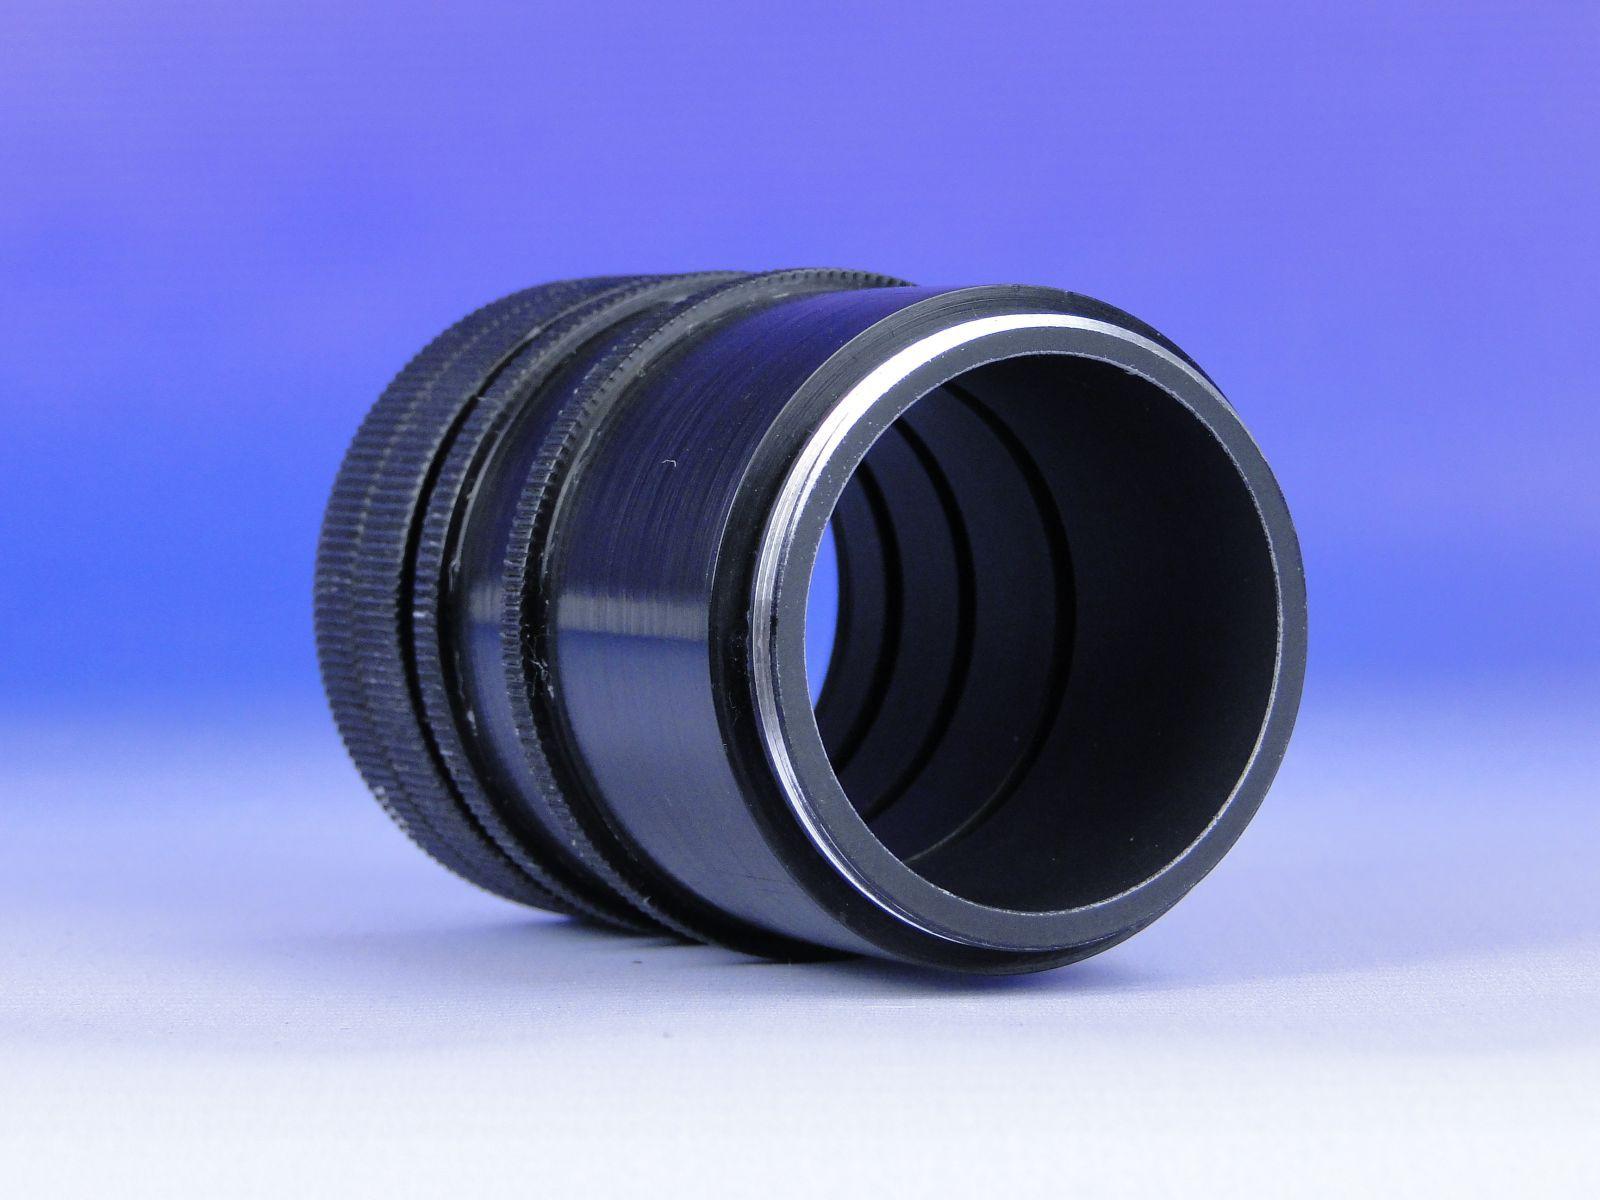 DSC08397.JPG (1600×1200)